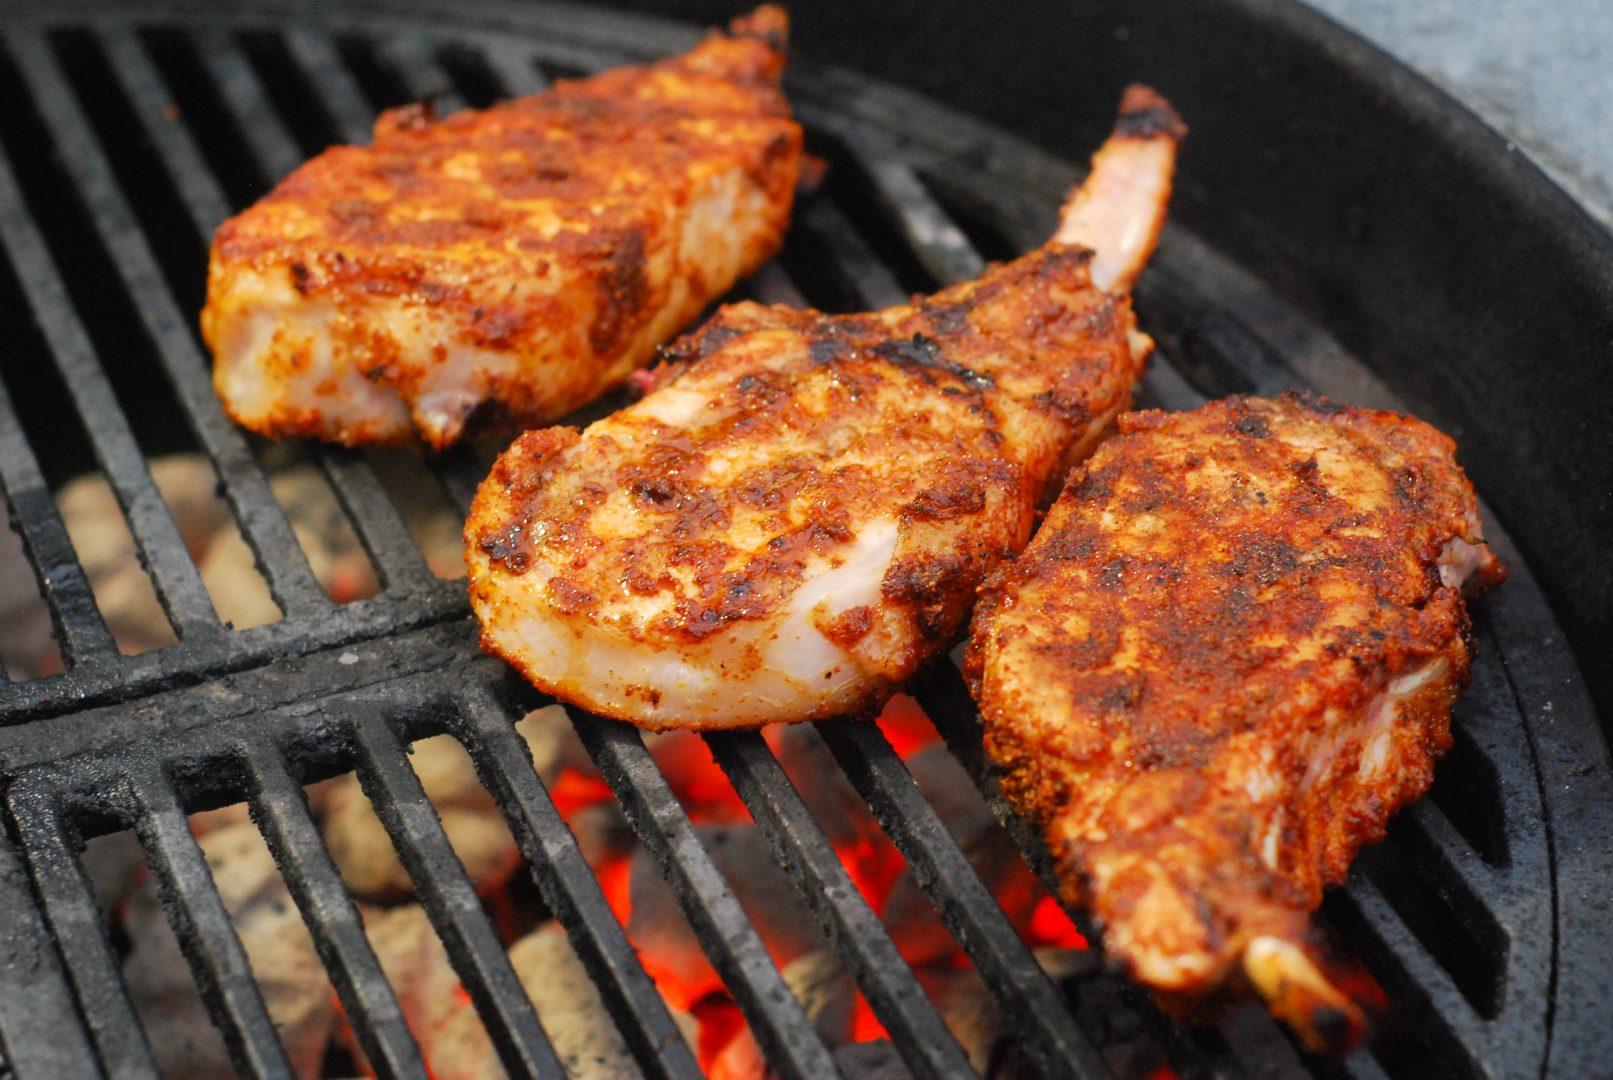 grill girl, Robyn Medlin, GrillGrrrl, reverse sear grilling method